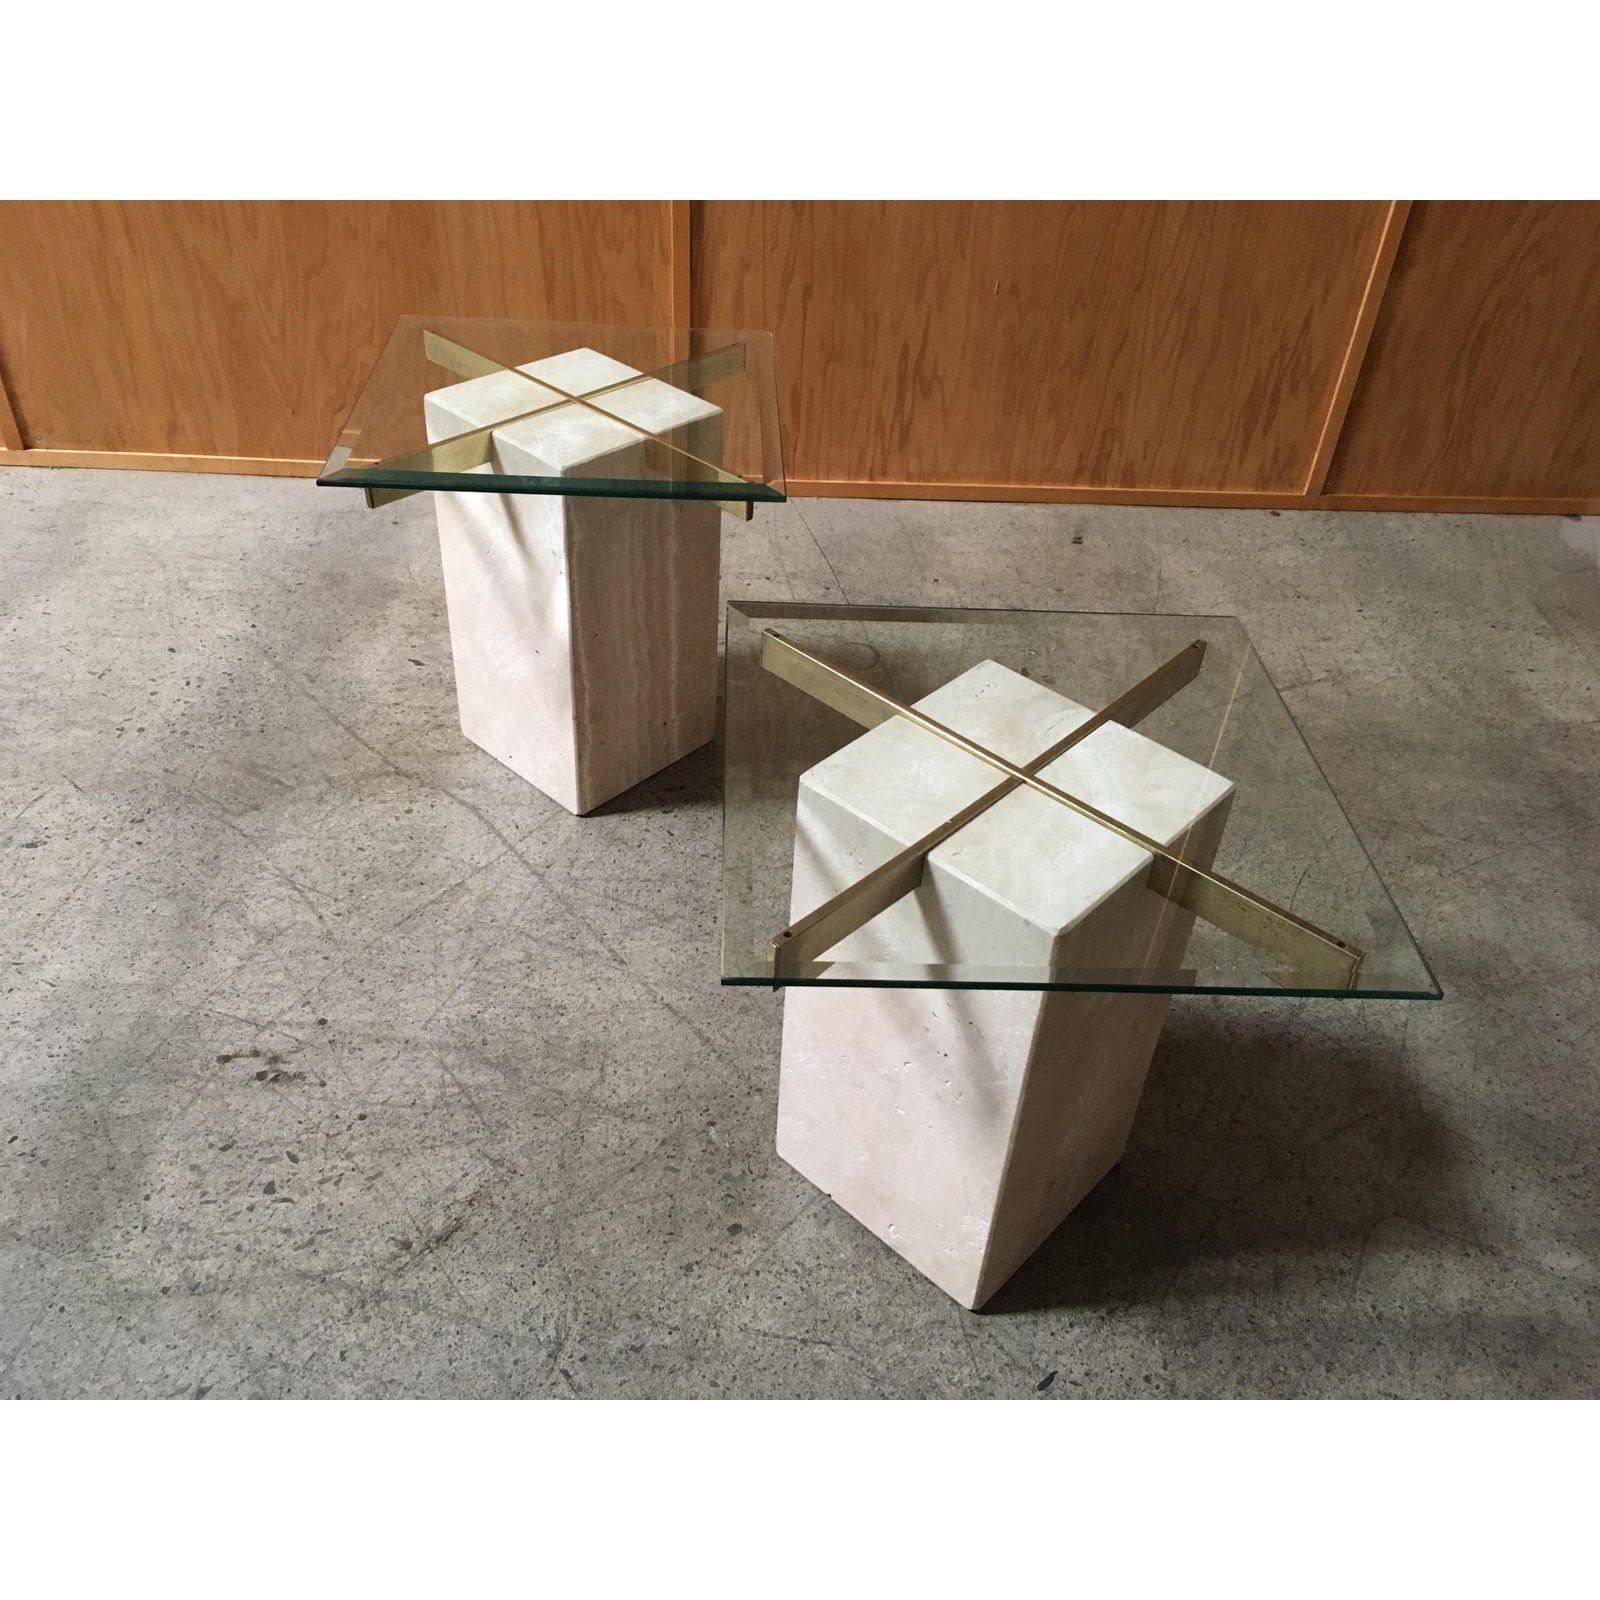 Artedi Travertine Tables A Pair Chairish Furniture Details Design Furniture Design Inspiration Diy Molding [ 1600 x 1600 Pixel ]